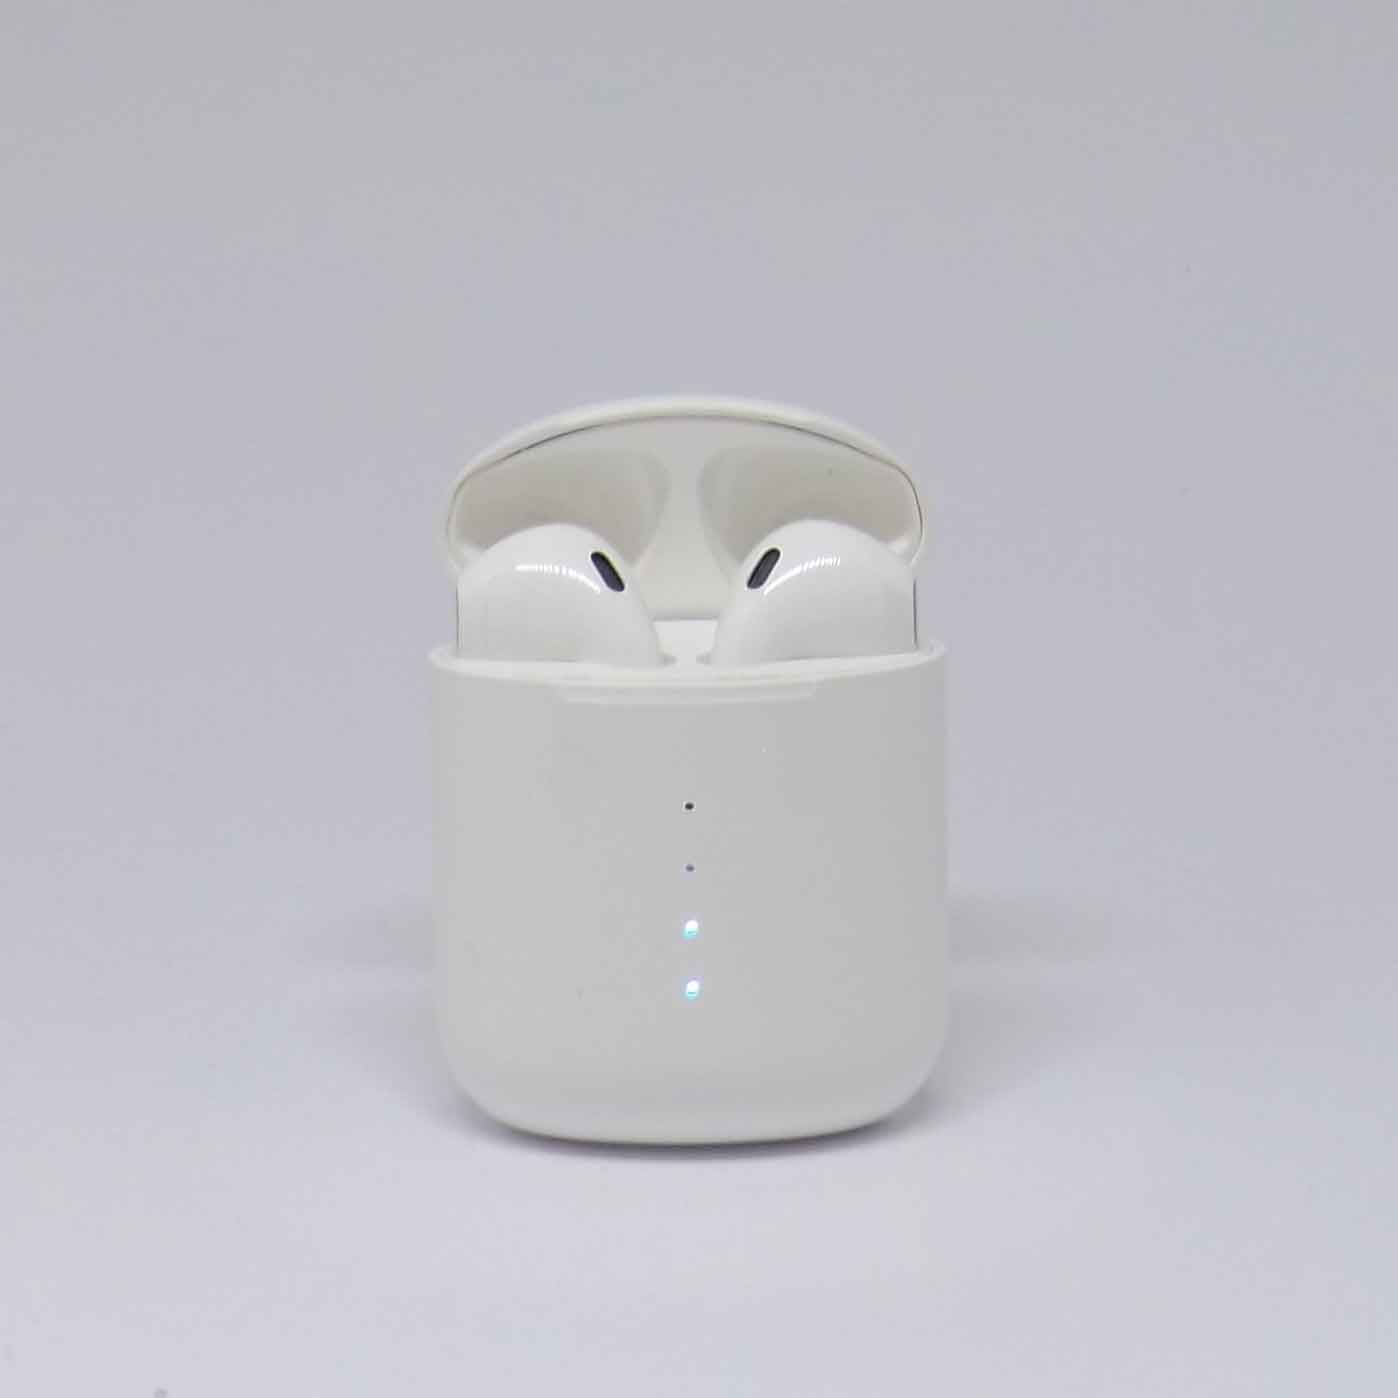 Fone de Ouvido Hmaston Bluetooth LY-118